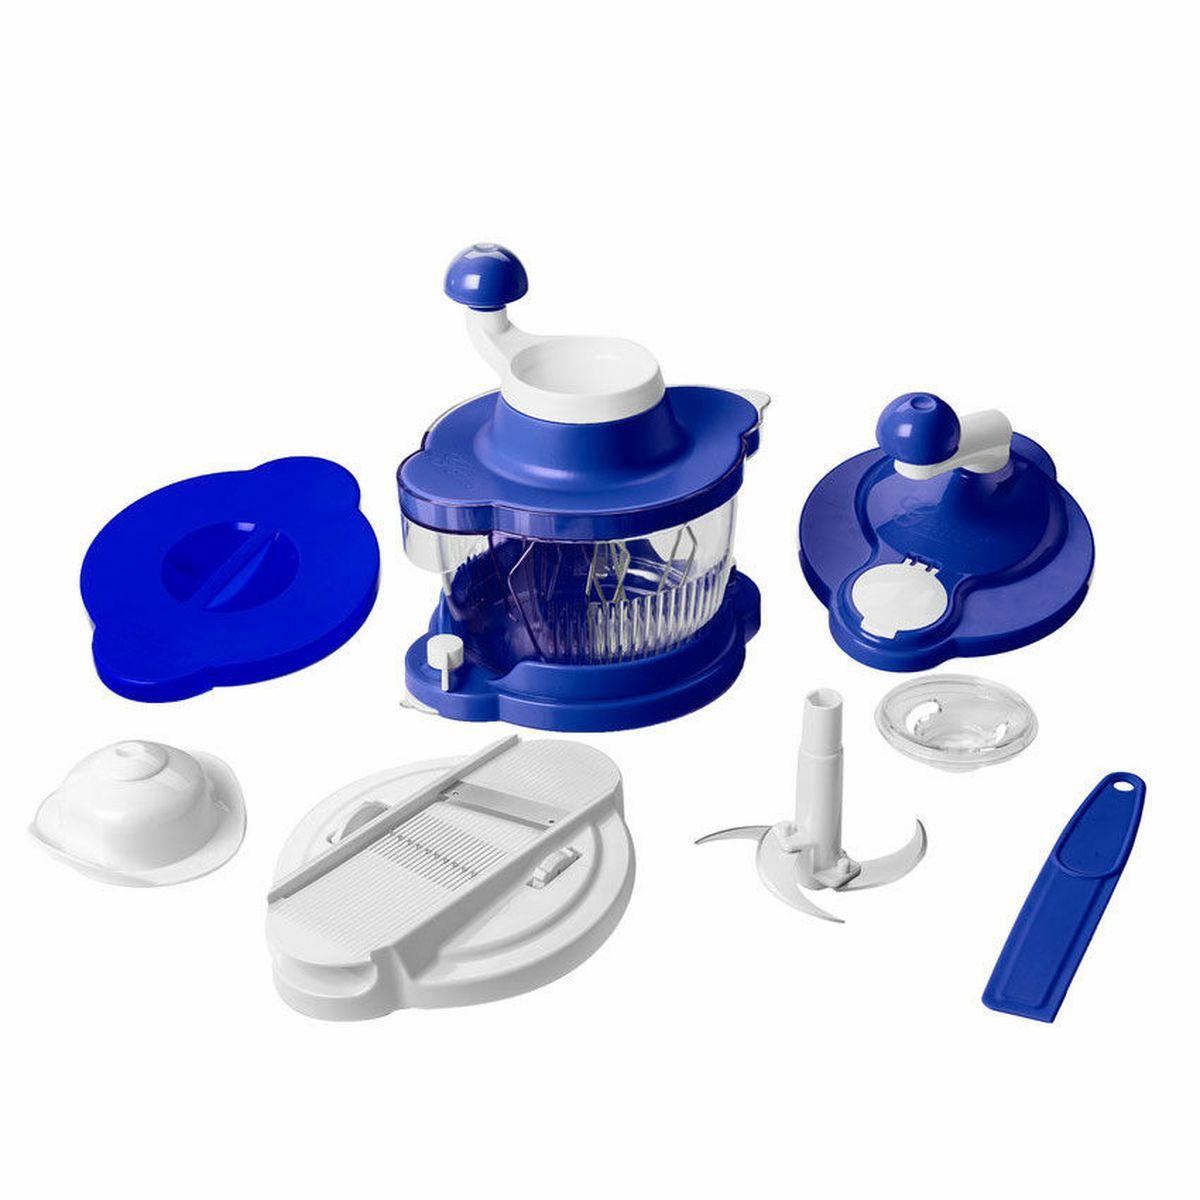 GENIUS  Twist-Cutter, 10-teilig, blau - bei Abholung in Filiale nur 12,99 €